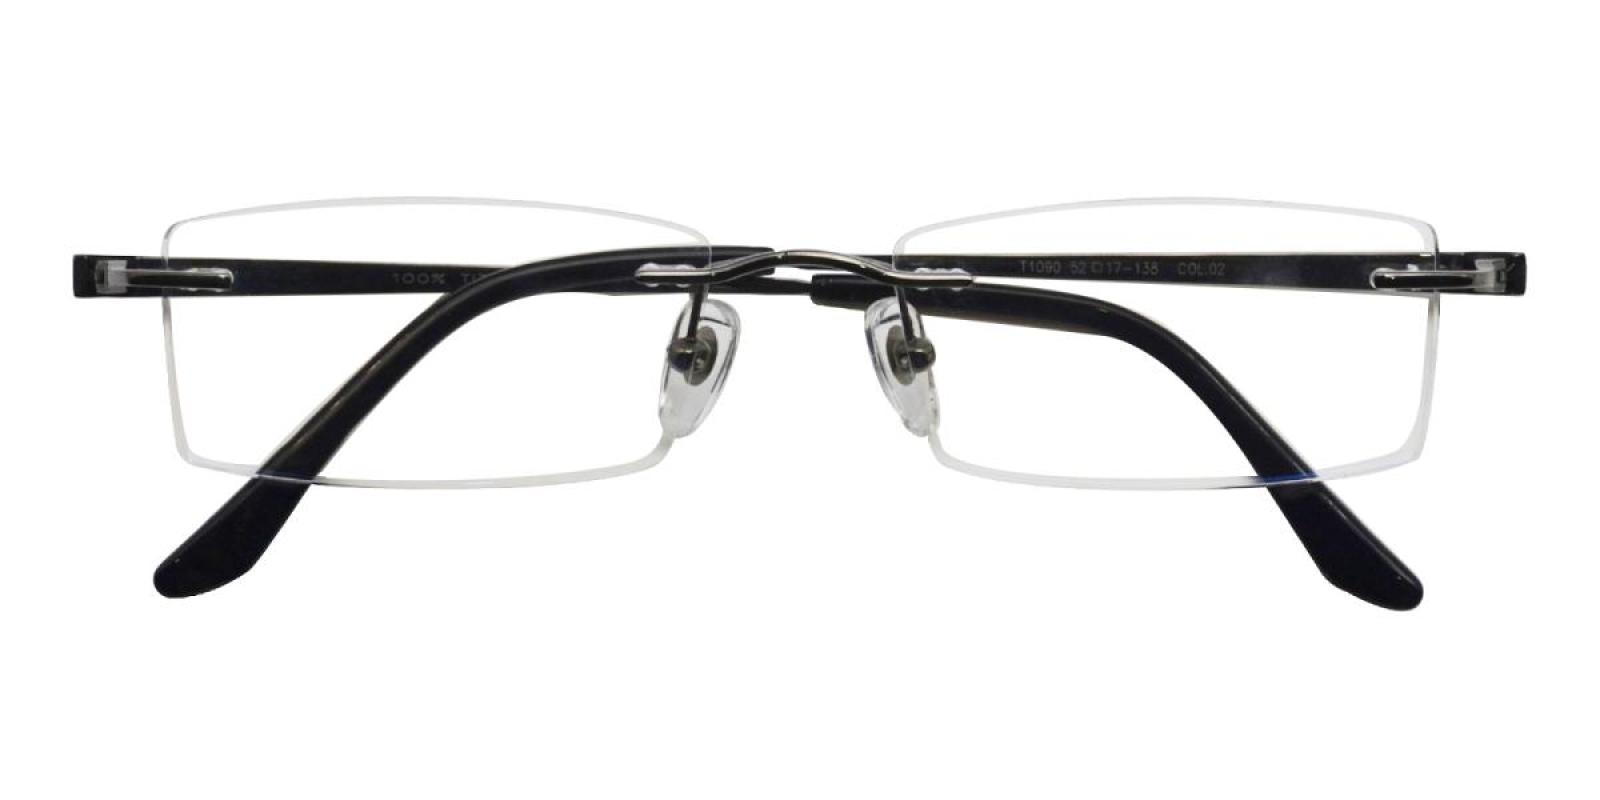 Benzalia-Gun-Varieties-Titanium-Eyeglasses-detail